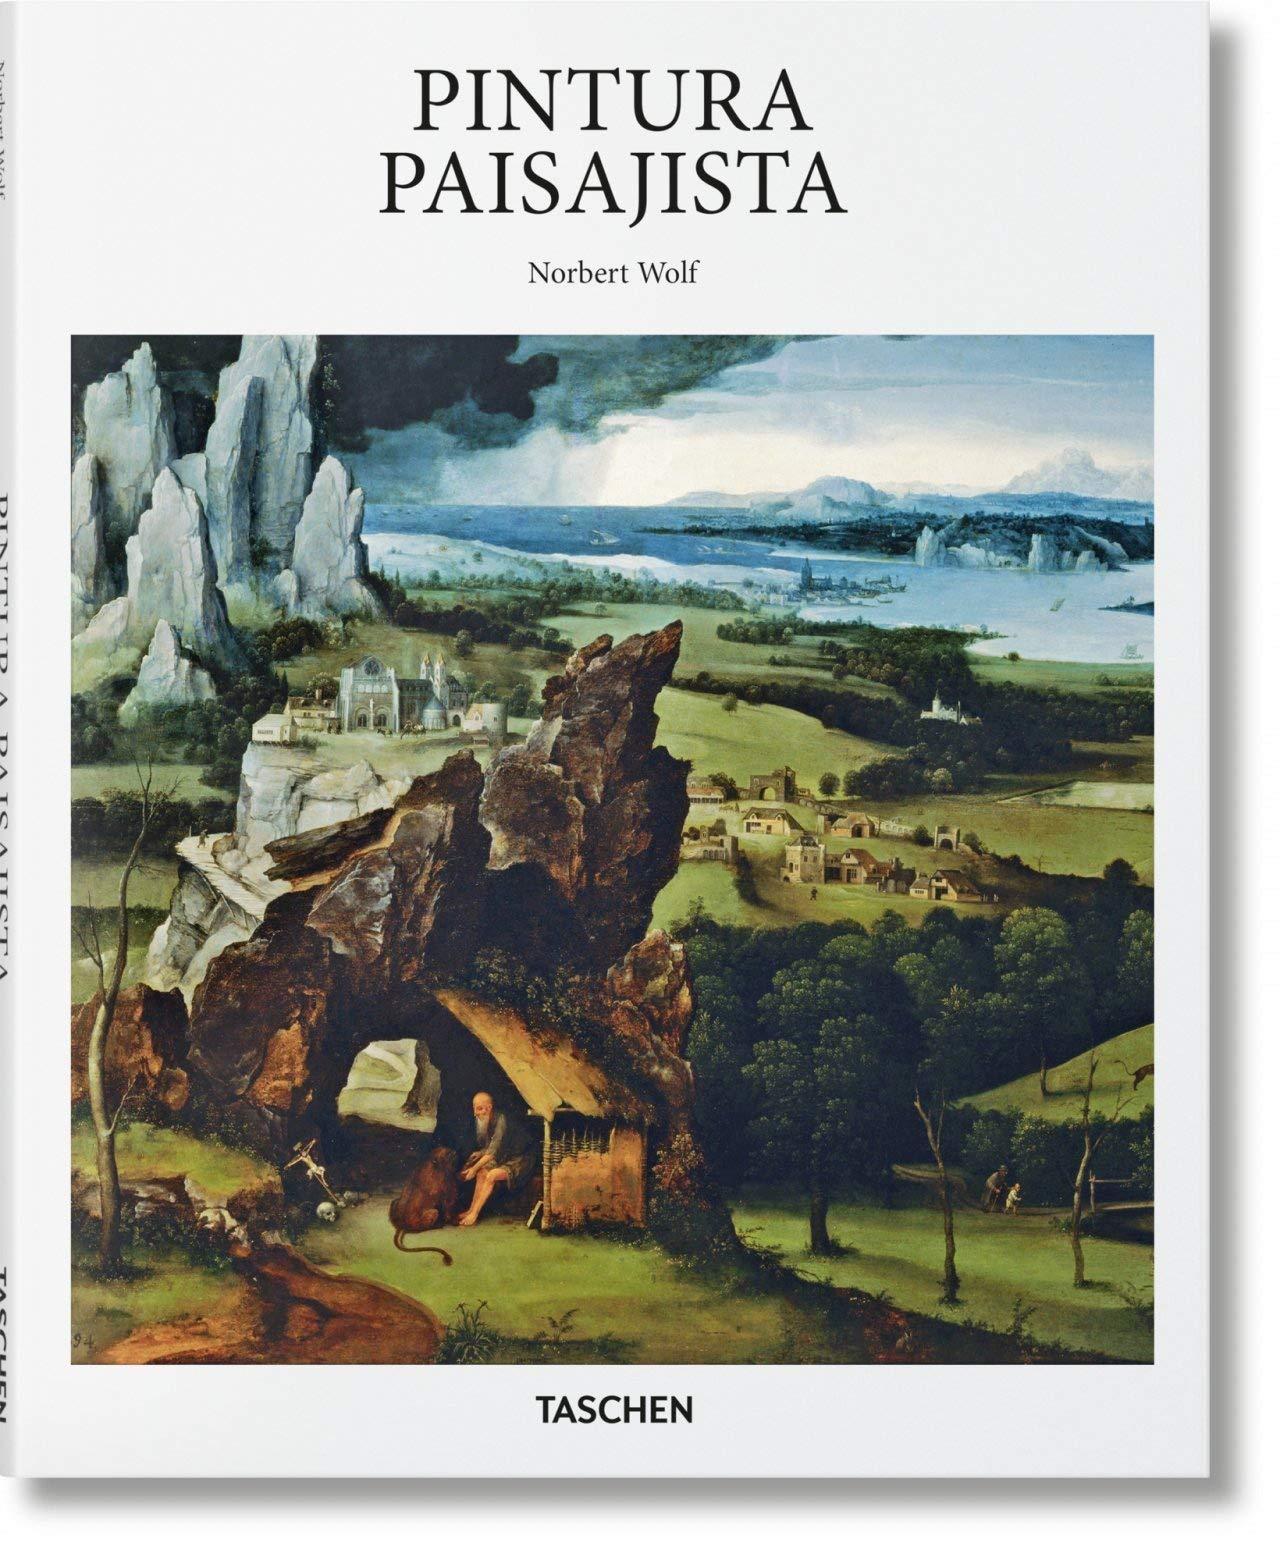 Pintura paisajista: Amazon.es: Norbert Wolf: Libros